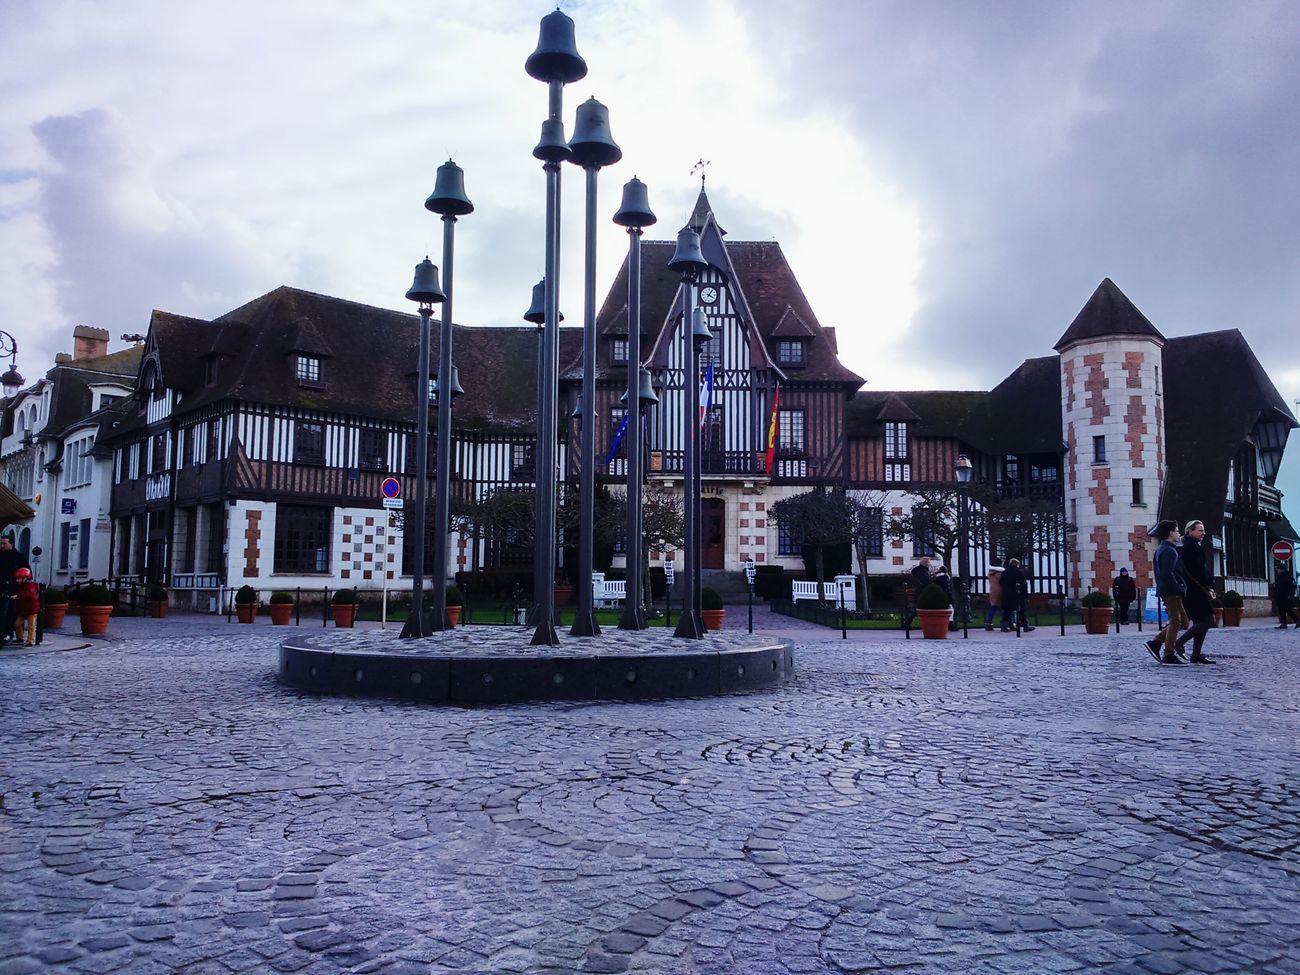 Les cloches de Deauville Cloches Bells Carrefour Crossroads Hôtel De Ville Cityhall Eyeem Urban Photography Deauville France Feel The Journey